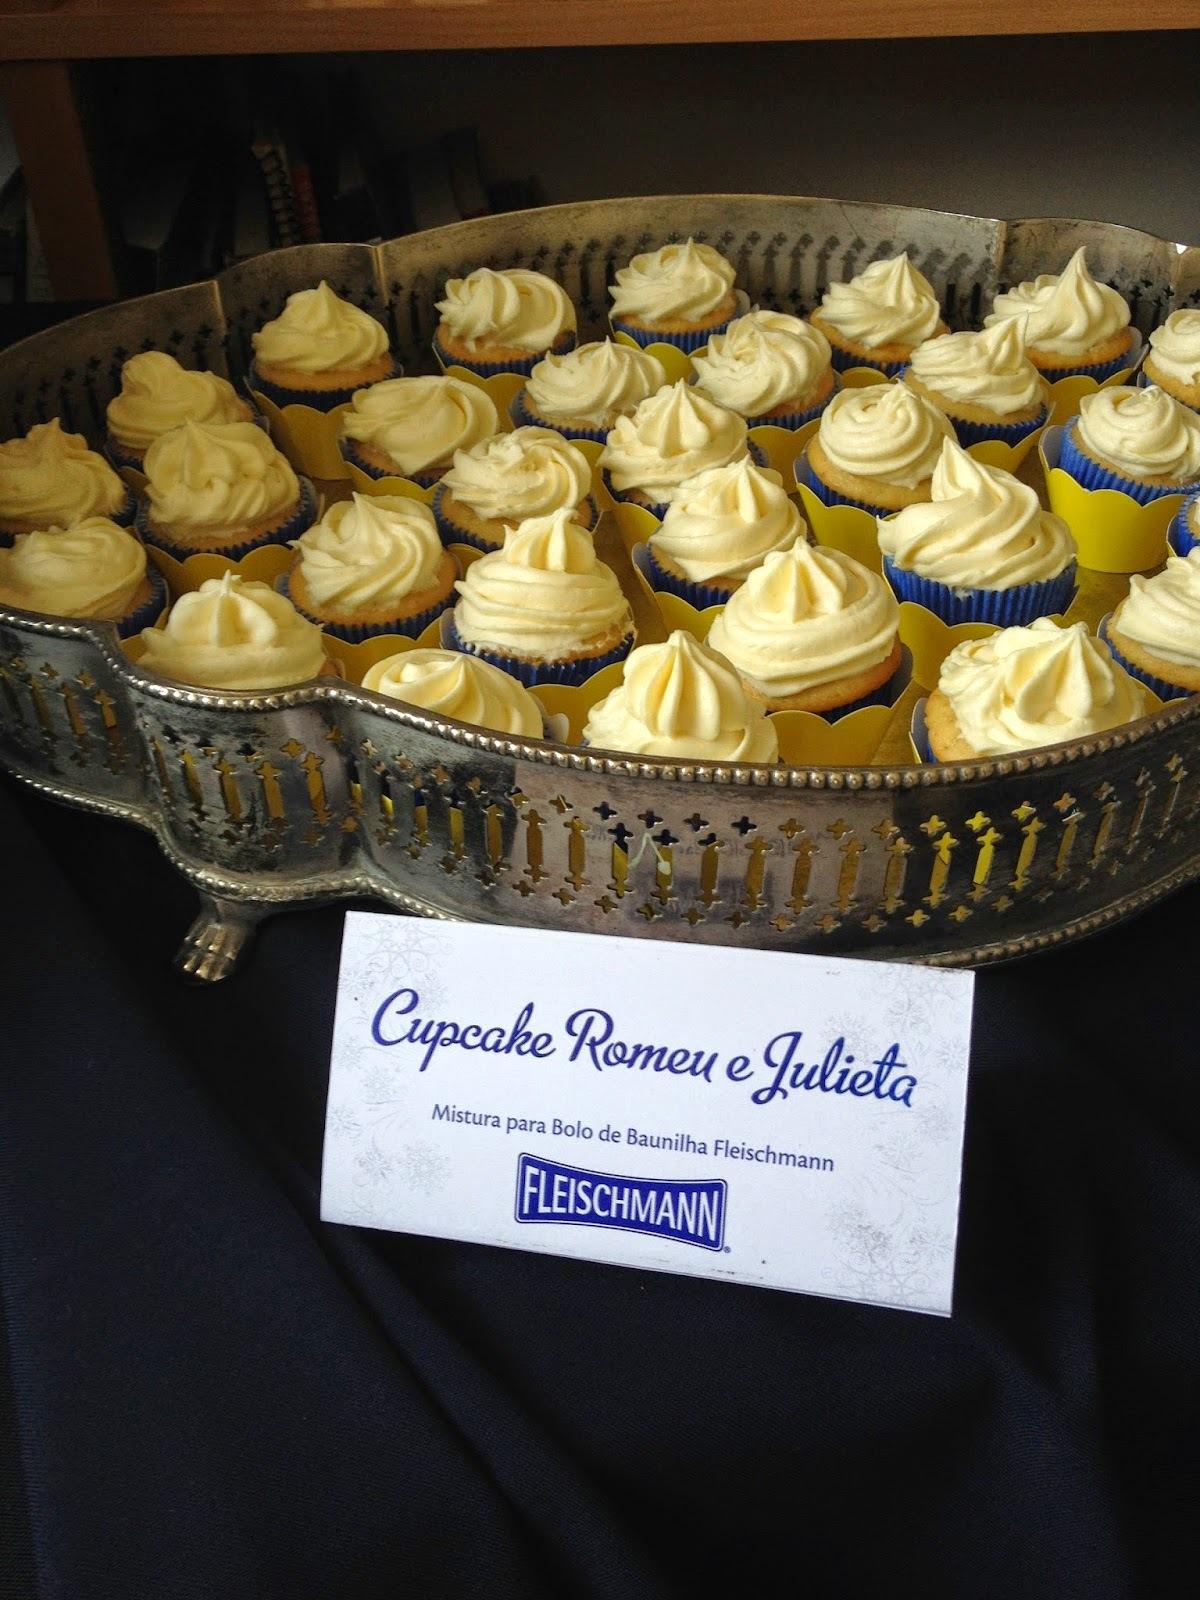 Cupcake Romeu e Julieta